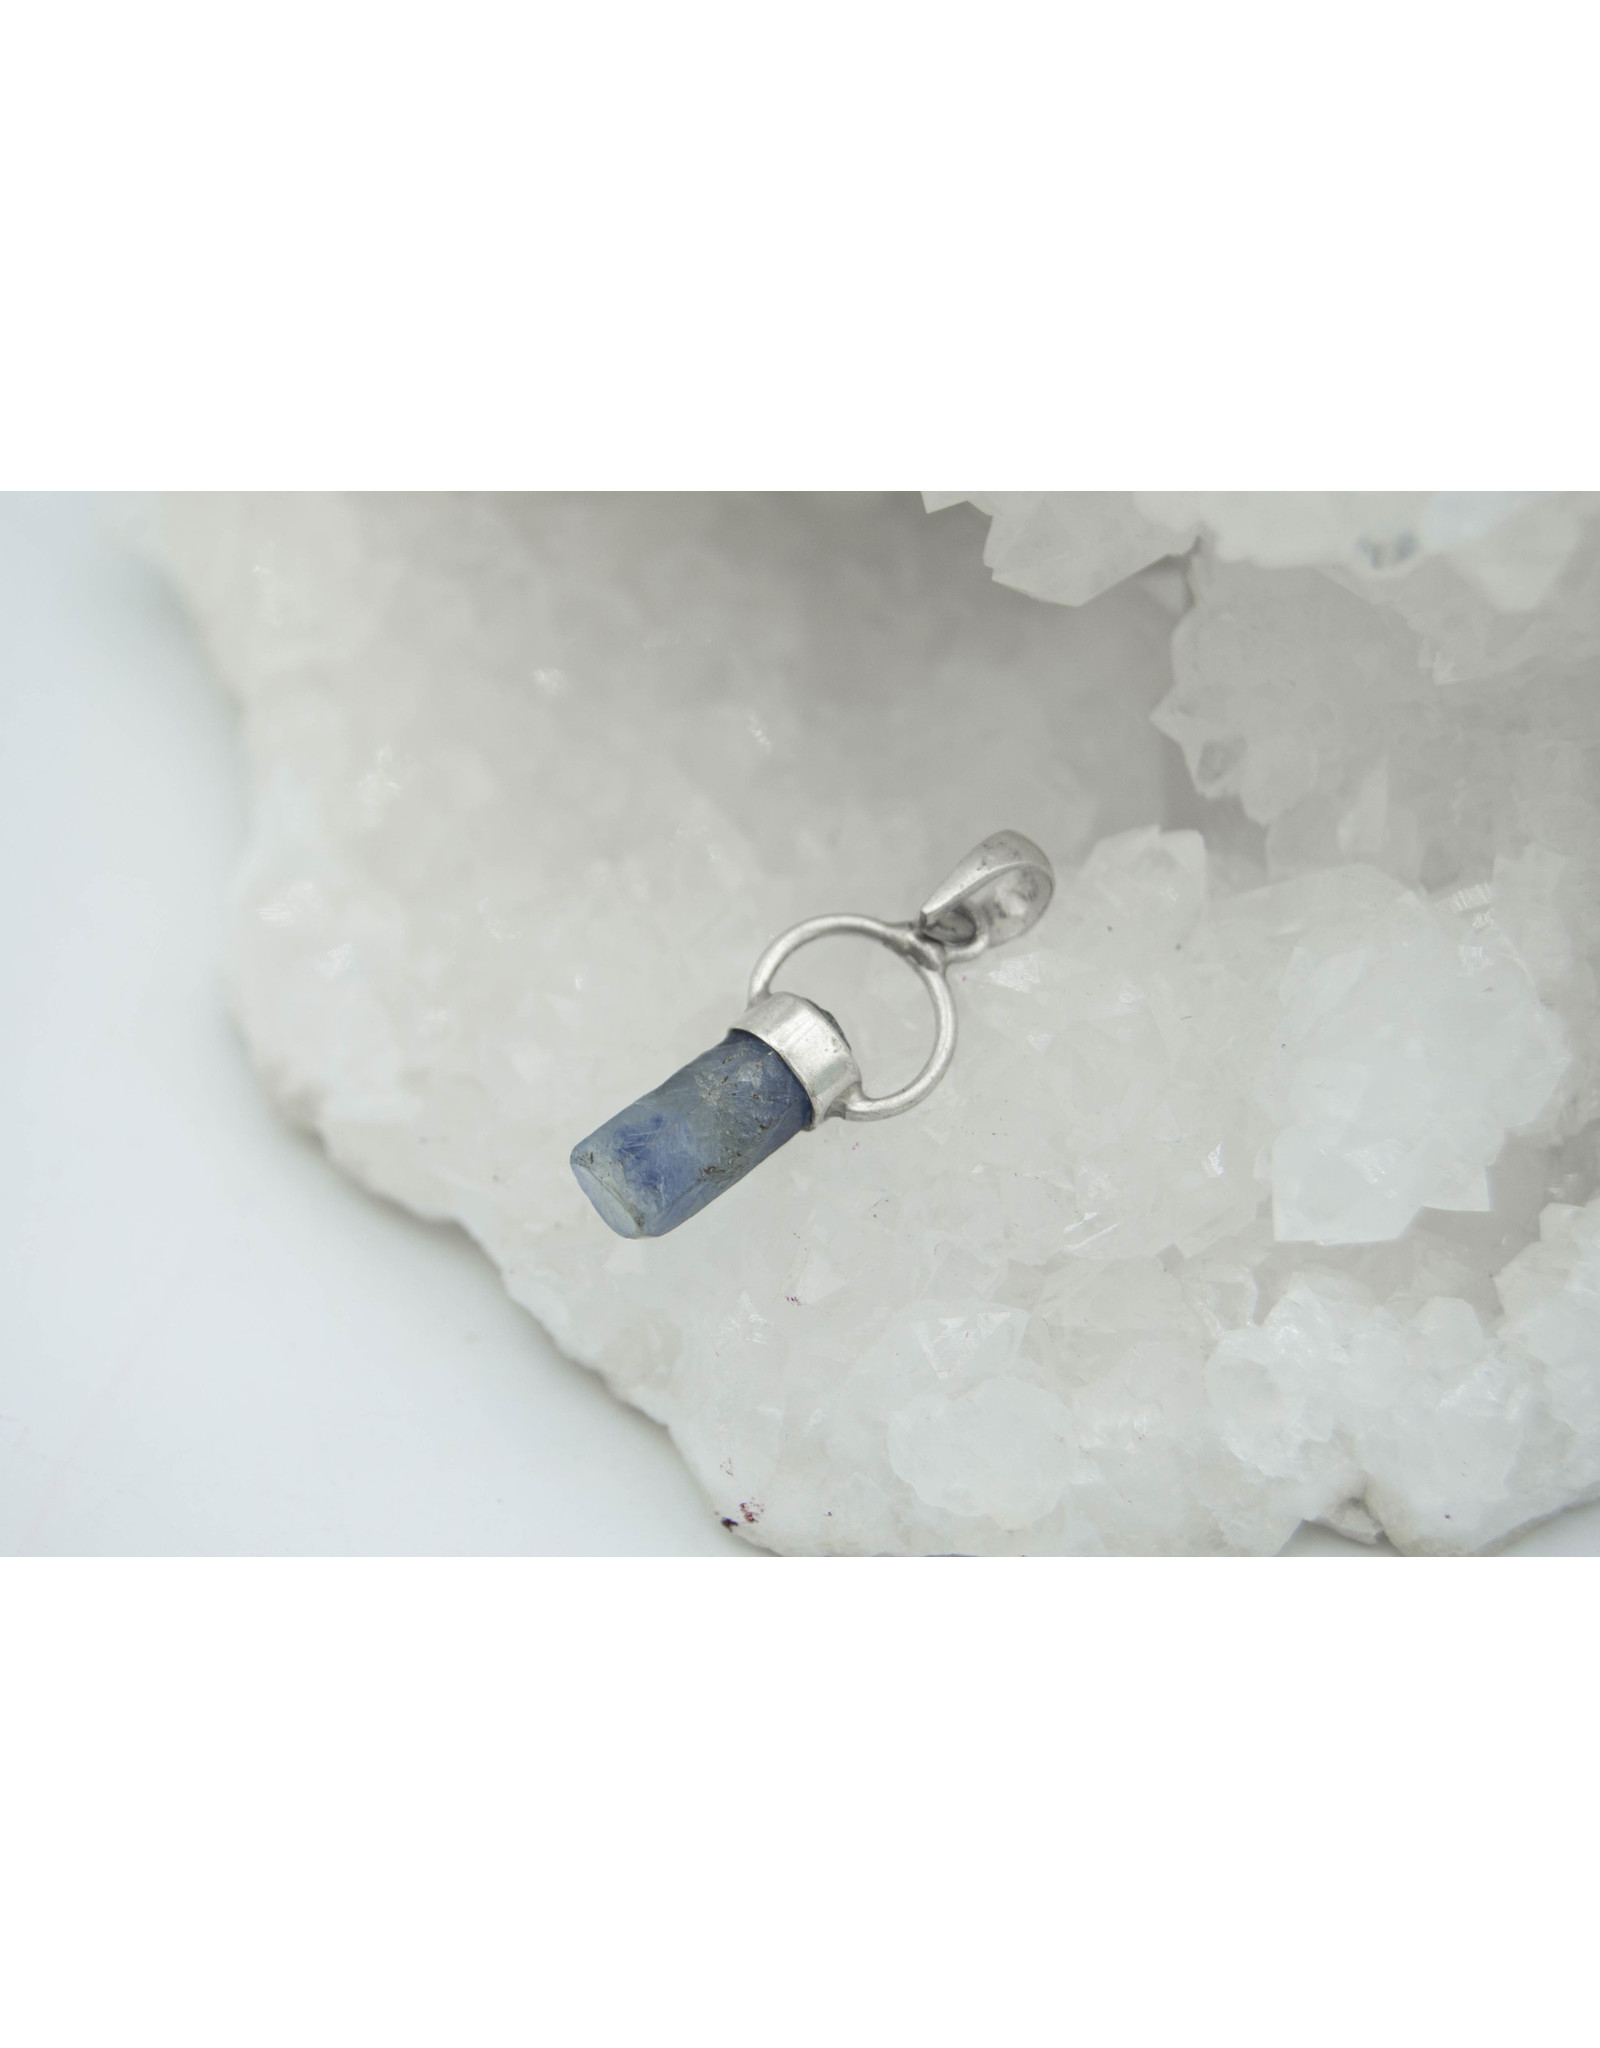 Raw Sapphire Pendant